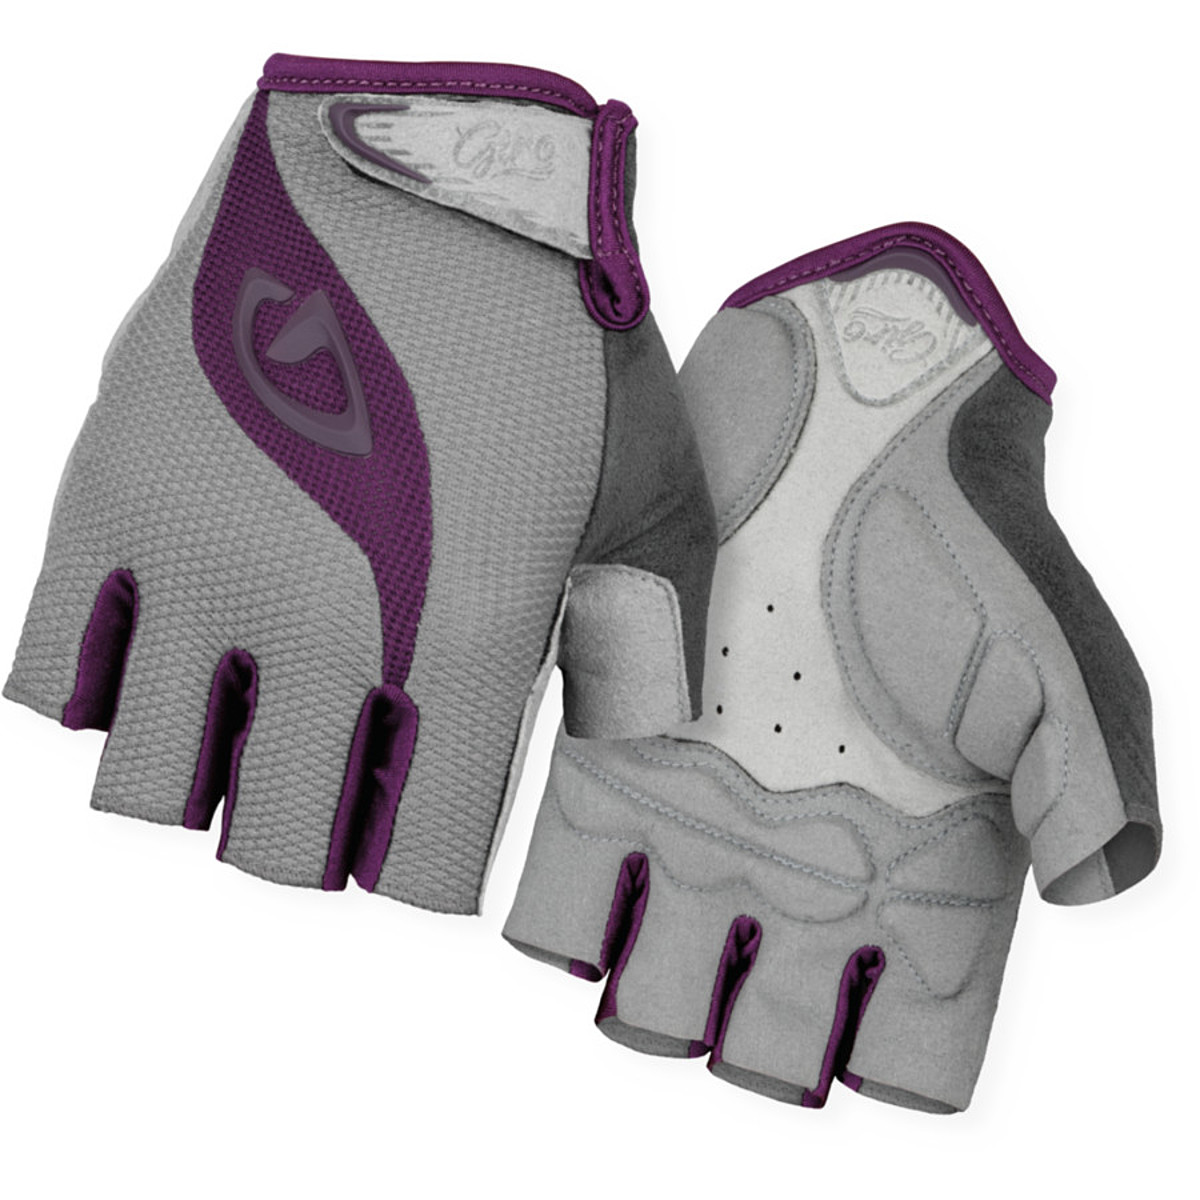 Shop for Giro Tessa Glove - Women's